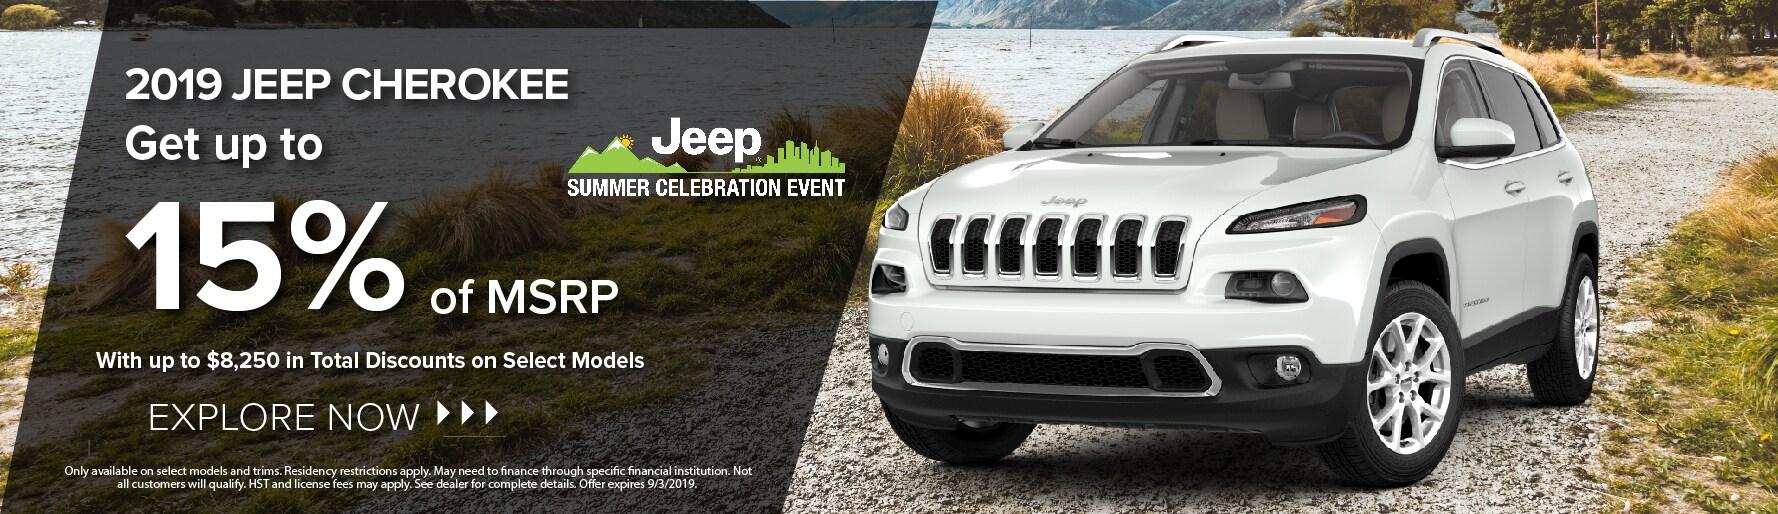 Capital Dodge Edmonton >> Capital Motors Dodge Jeep Ram New Chrysler Jeep Dodge